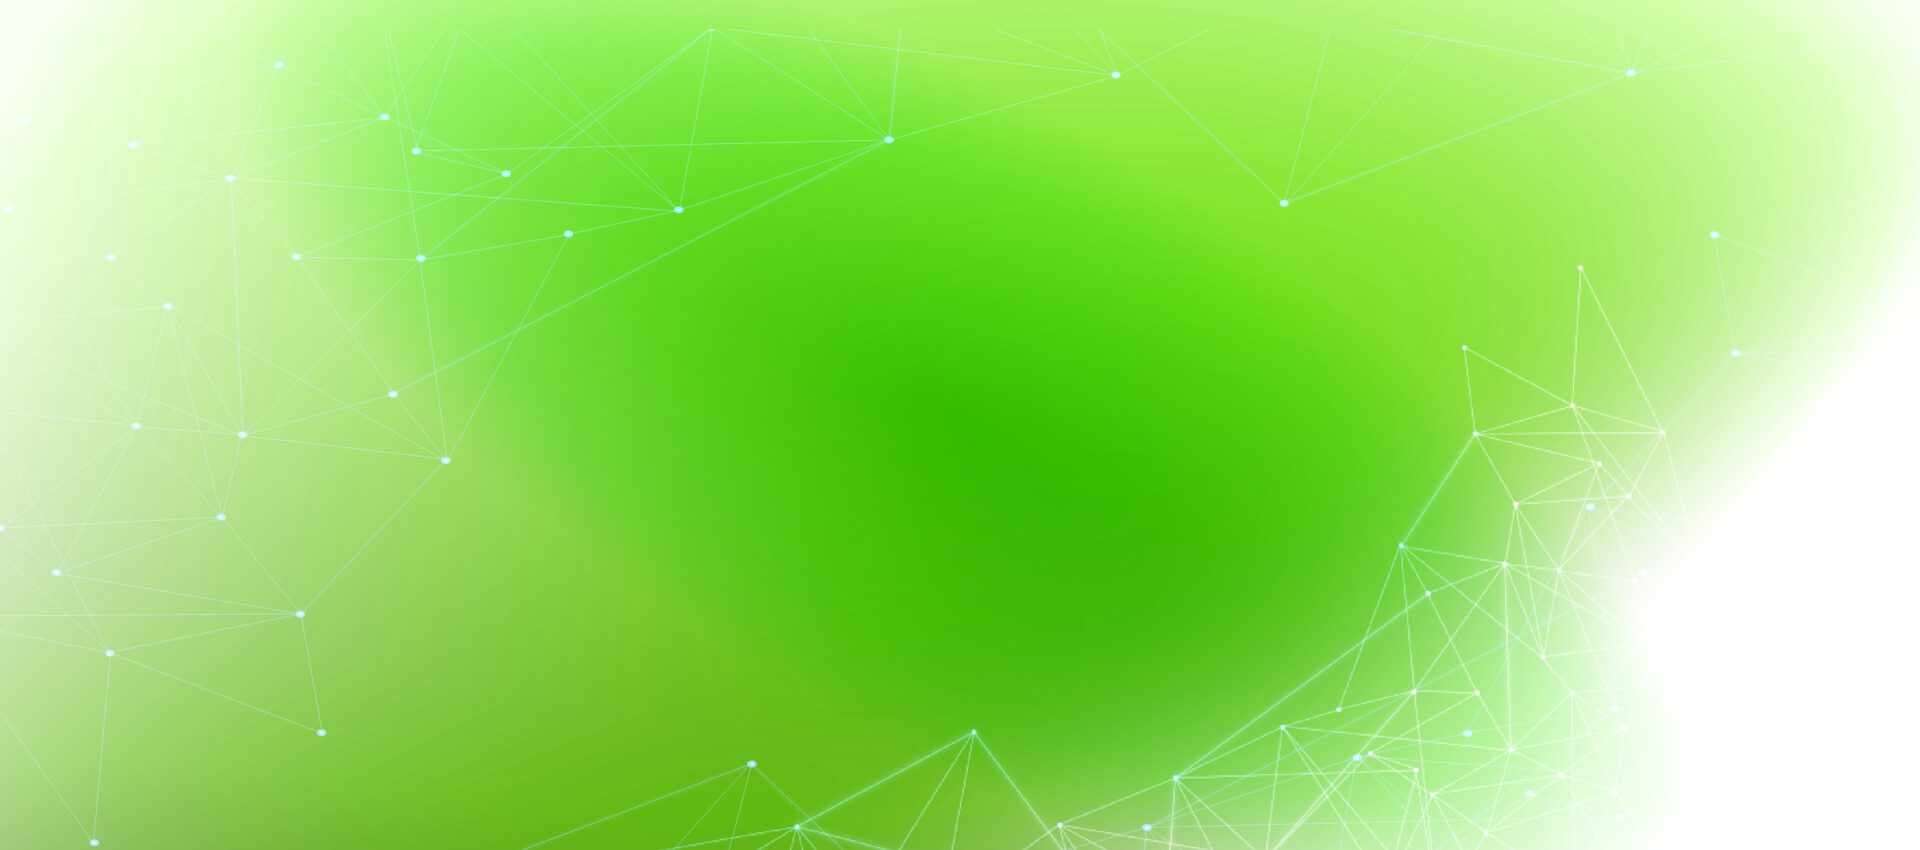 WhiteJar - green background